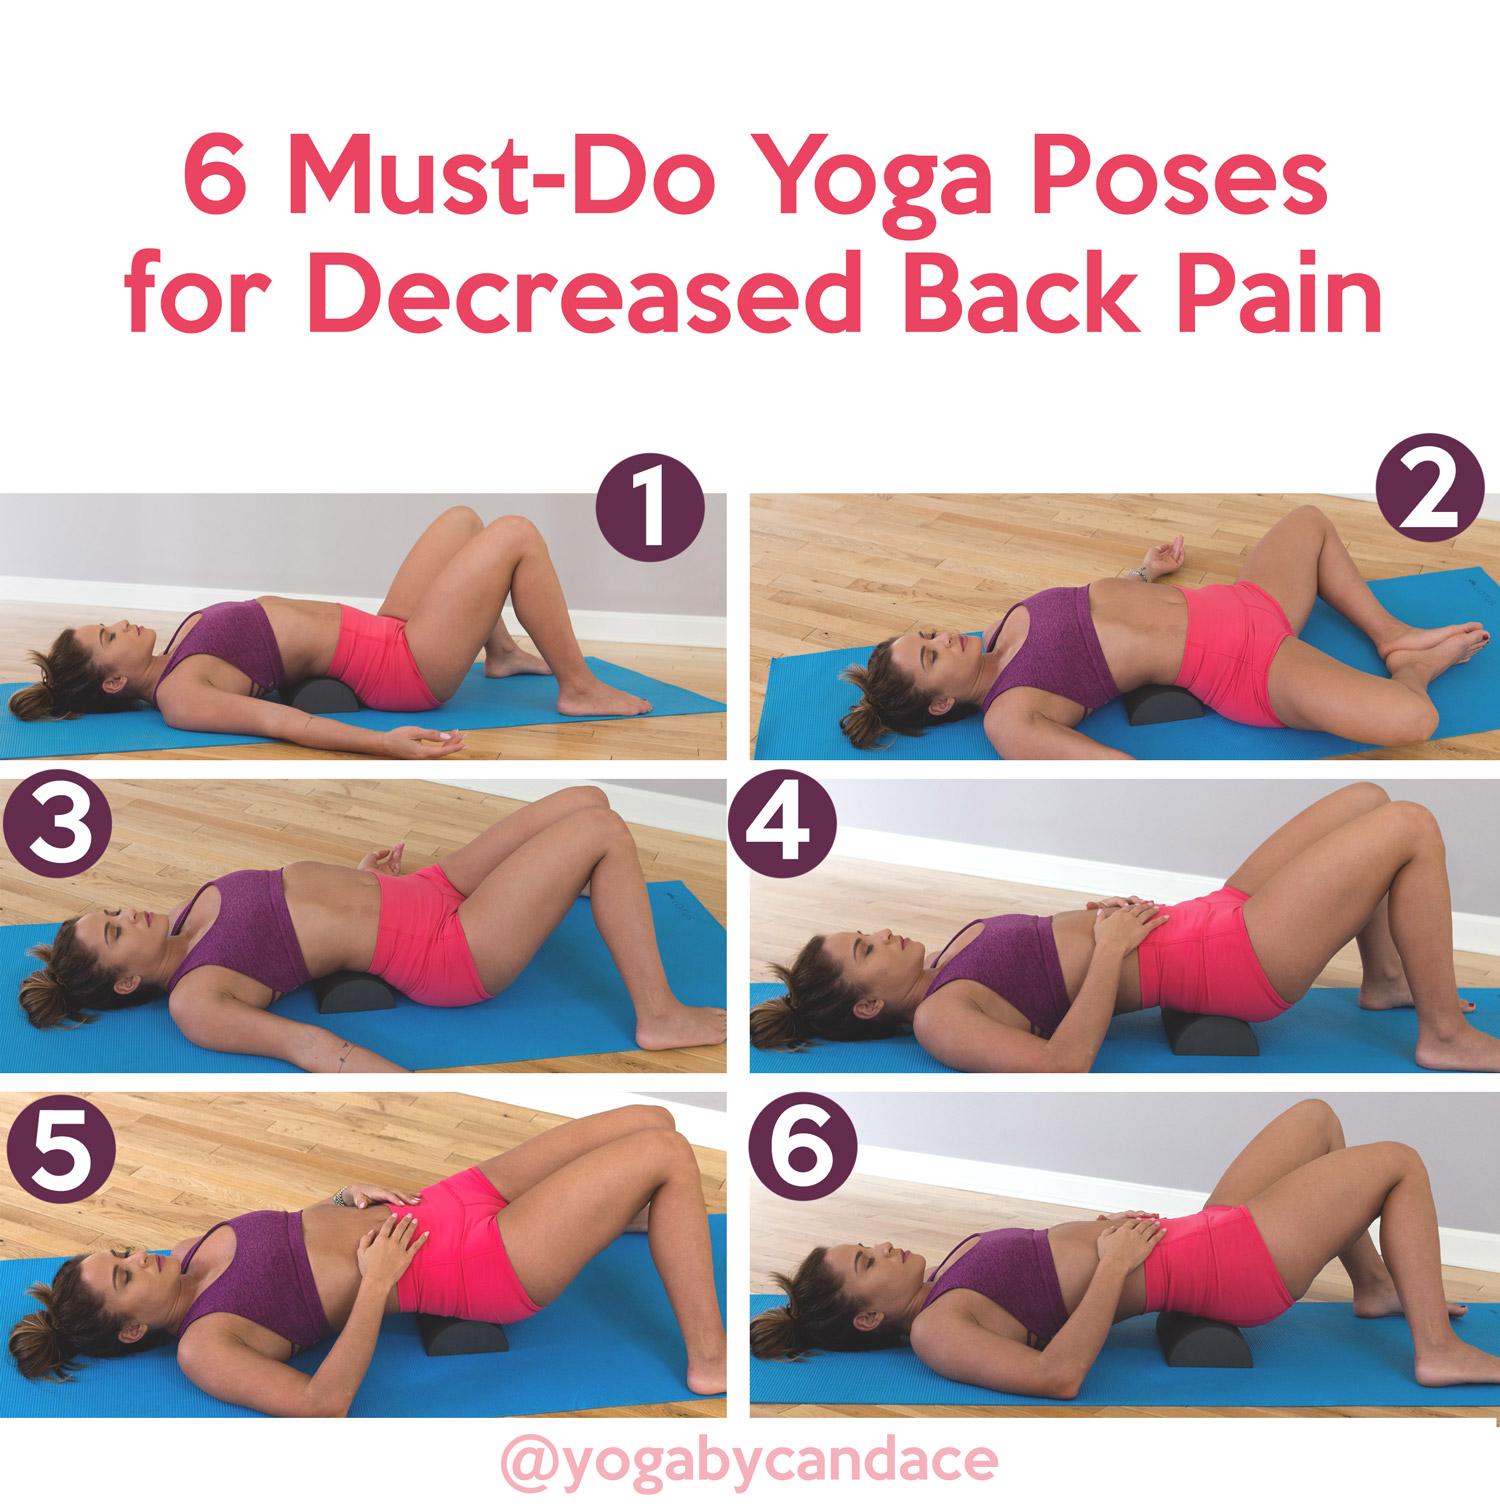 50 Must Do Yoga Poses for Decreased Back Pain — YOGABYCANDACE